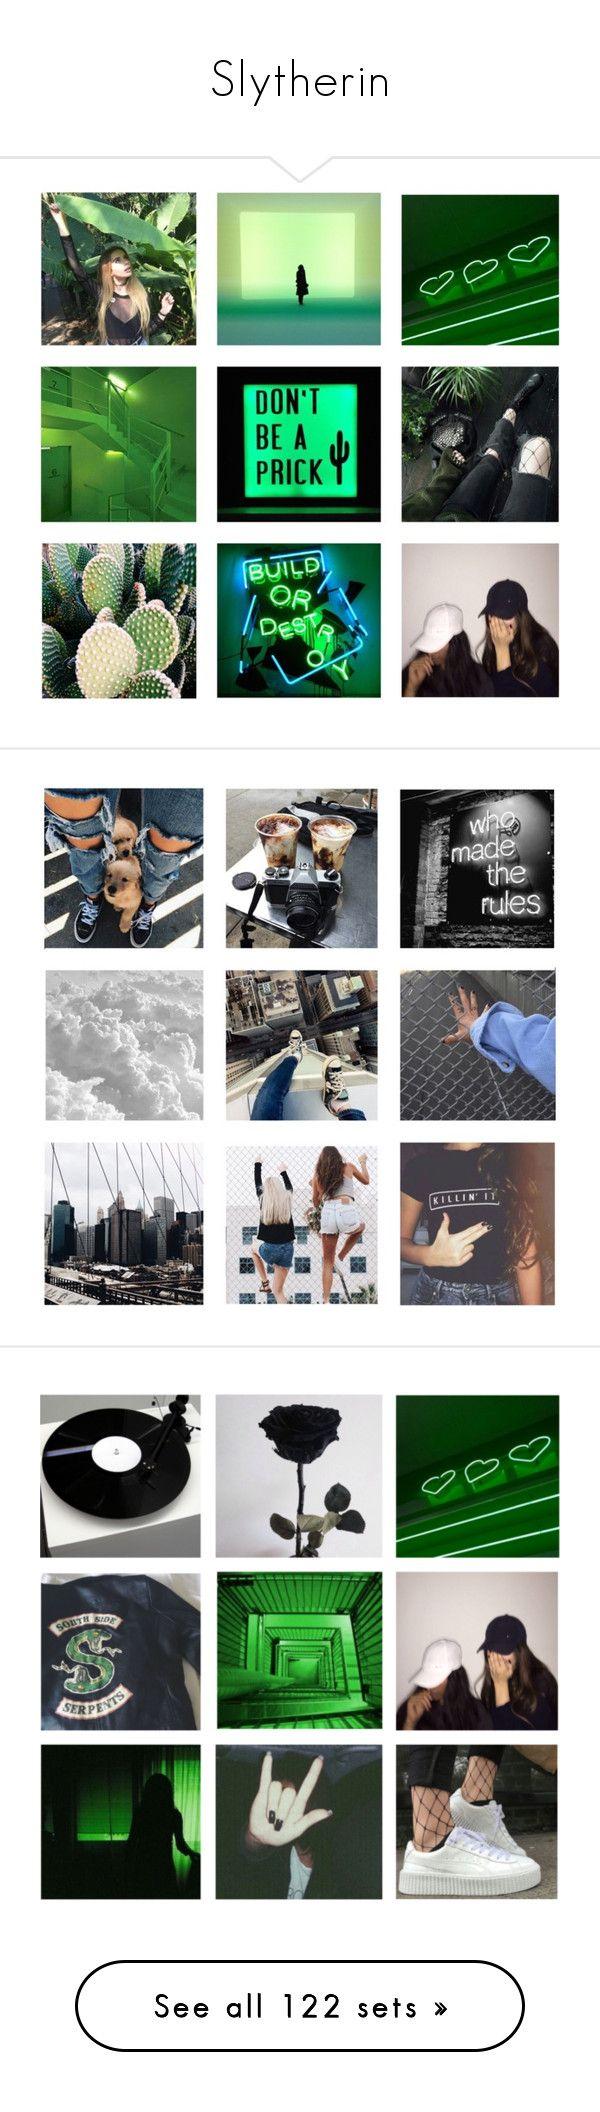 """Slytherin"" by ginga-ninja ❤ liked on Polyvore featuring art, skirts, mini skirts, bottoms, faldas, leather skirt, leather skort, real leather mini skirt, leather mini skirt and empire waist skirt"